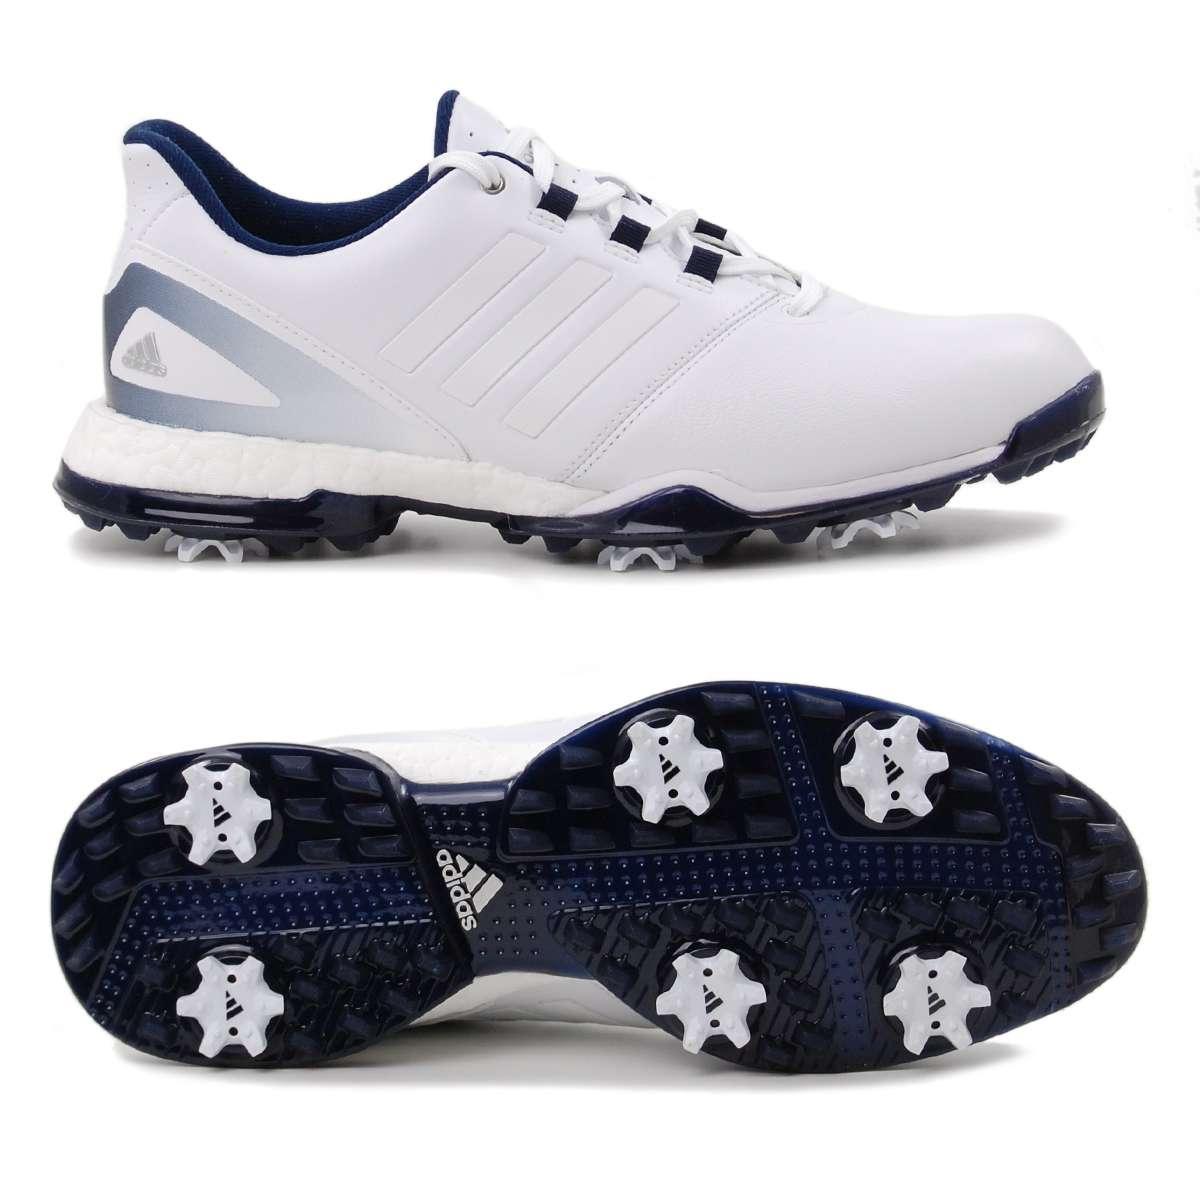 free shipping b9102 3717d Adidas adipower Boost 3 Damen Golfschuhe, Weiß  Dunkelblau günstig kaufen   Golflädchen